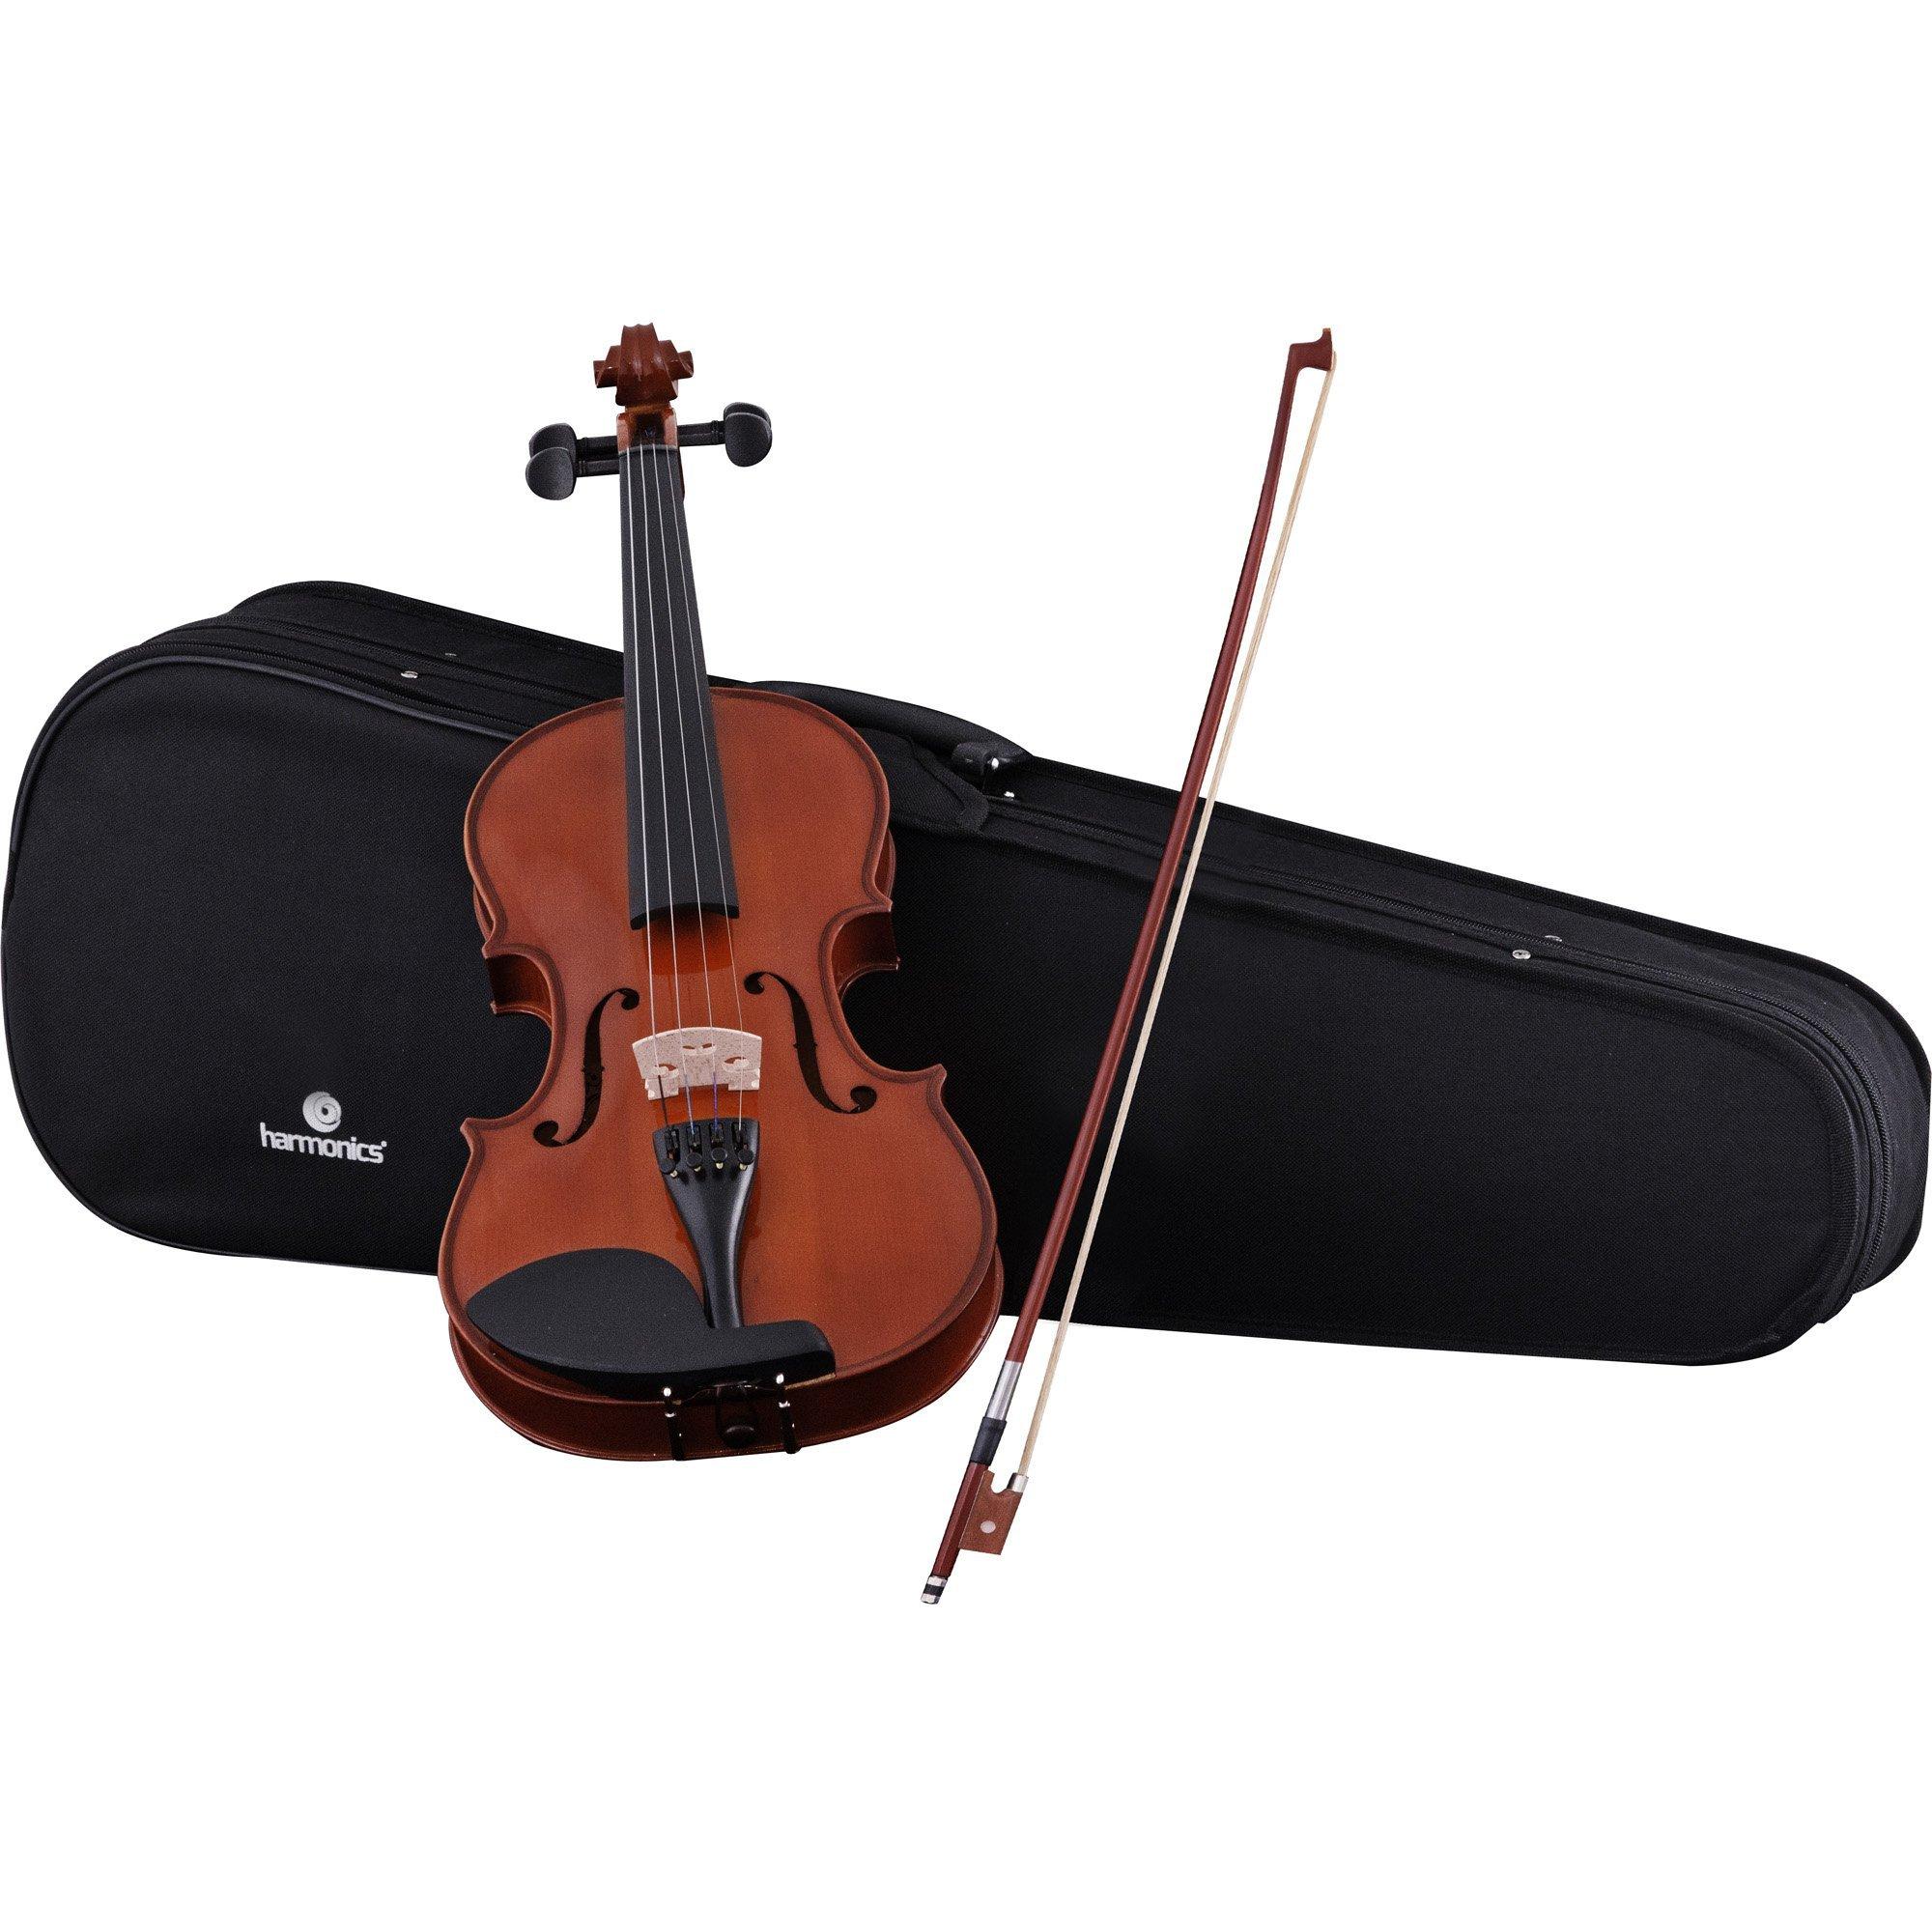 violino 4 4 va 10 oportunidade natural harmonics 42888 2000 181306